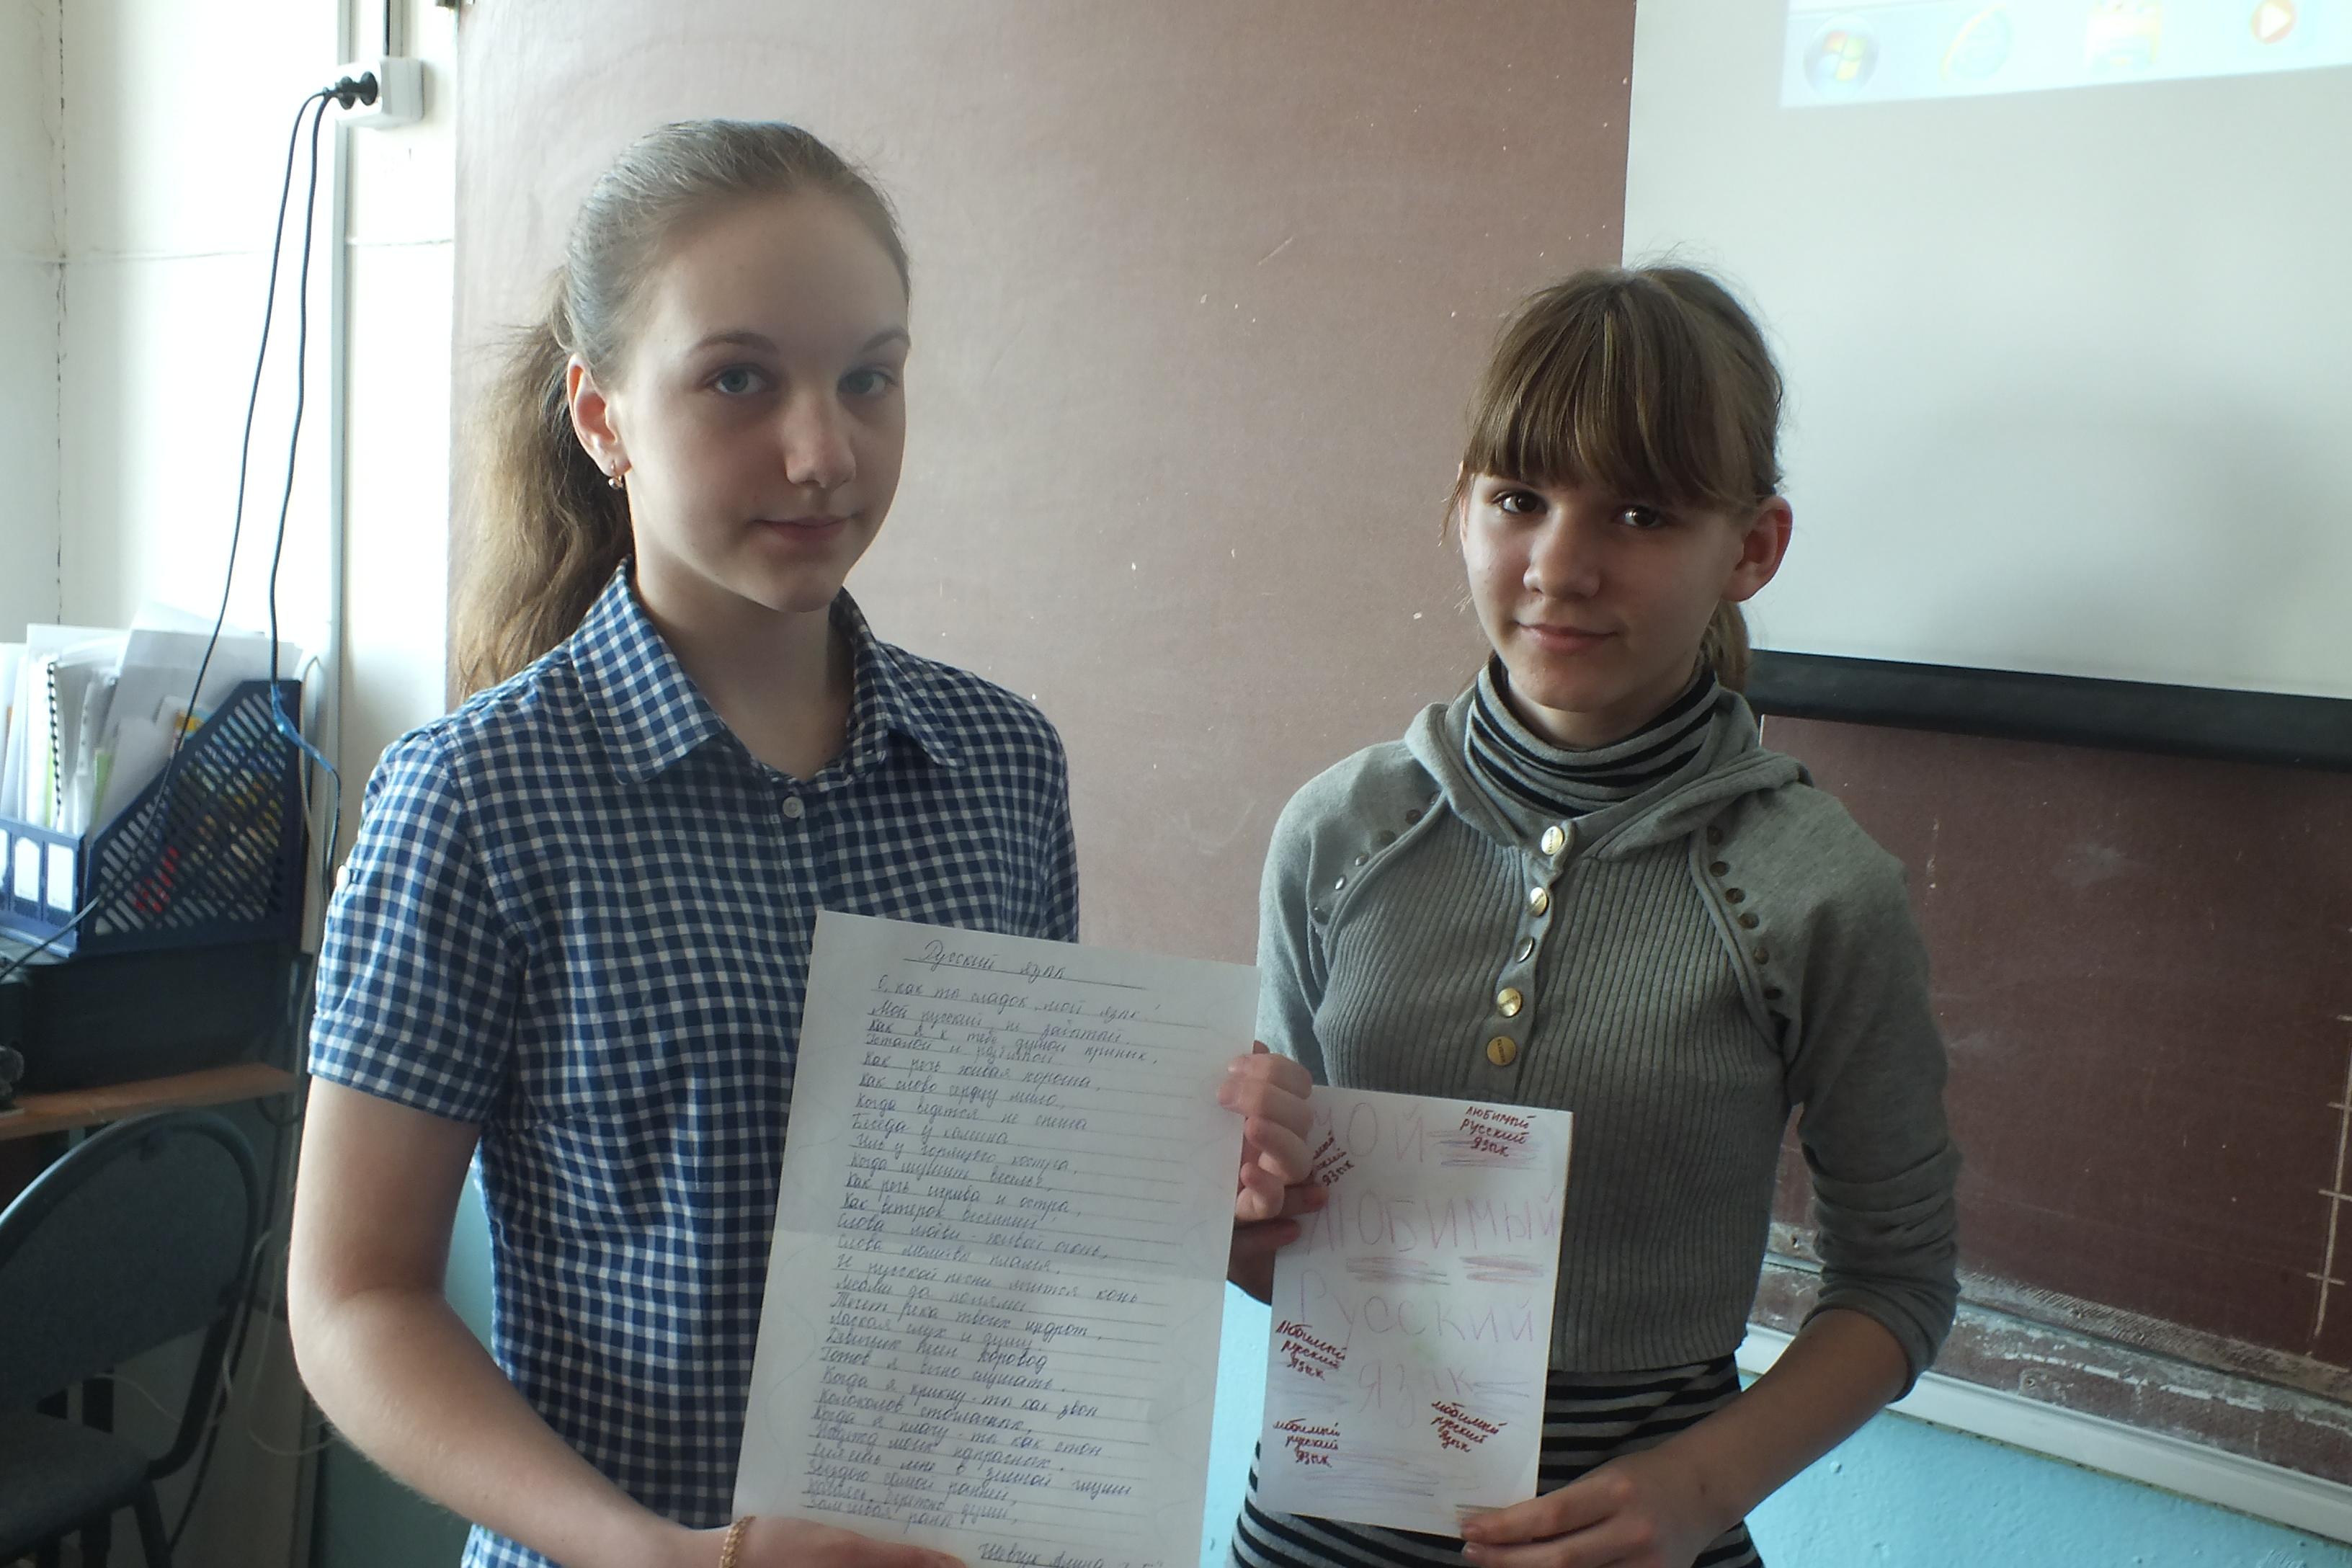 C:\Users\Юлия\Pictures\DSCF1335.JPG